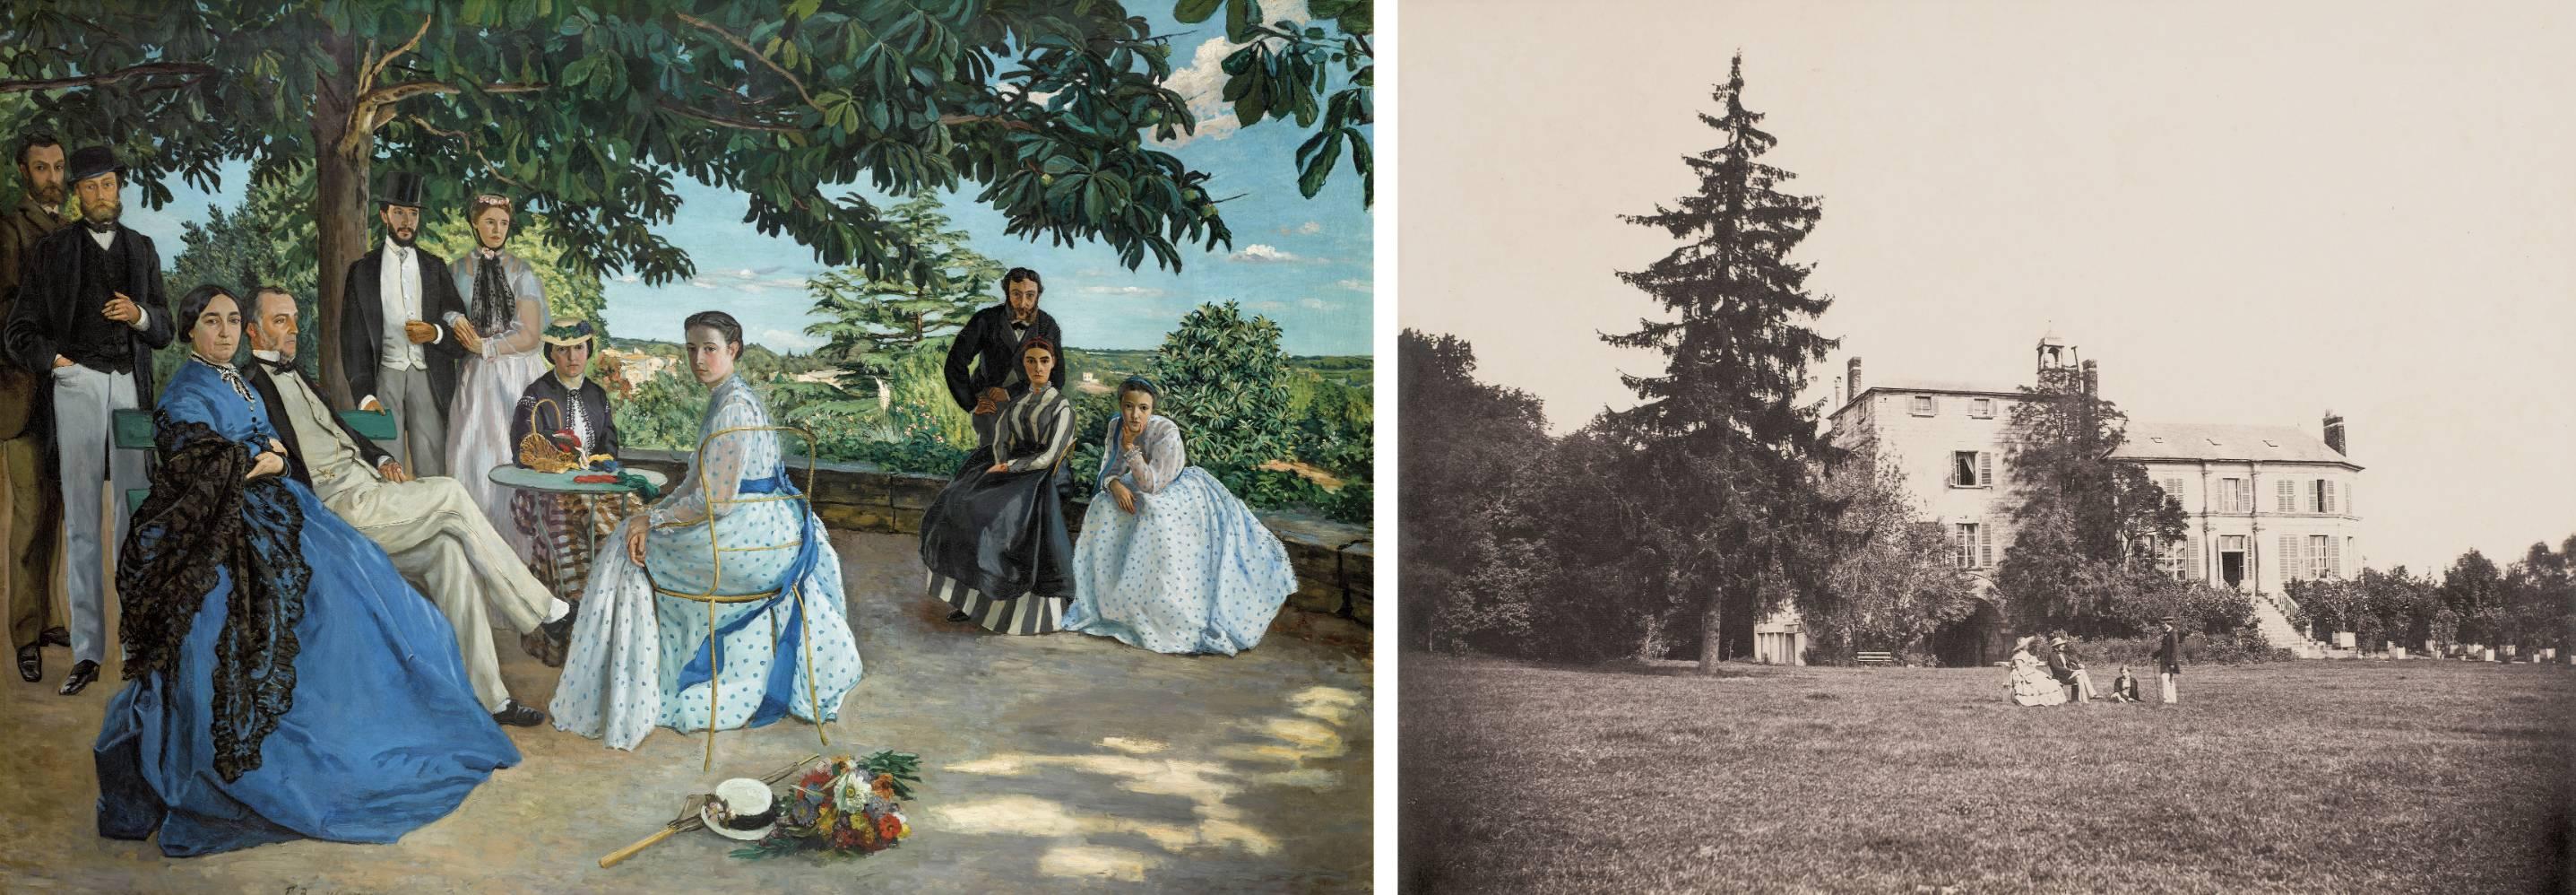 'Reunión familiar', de Frederic Bazille y 'Chateau de La Faloise, al final de la mañana', de Èdouard Baldus.